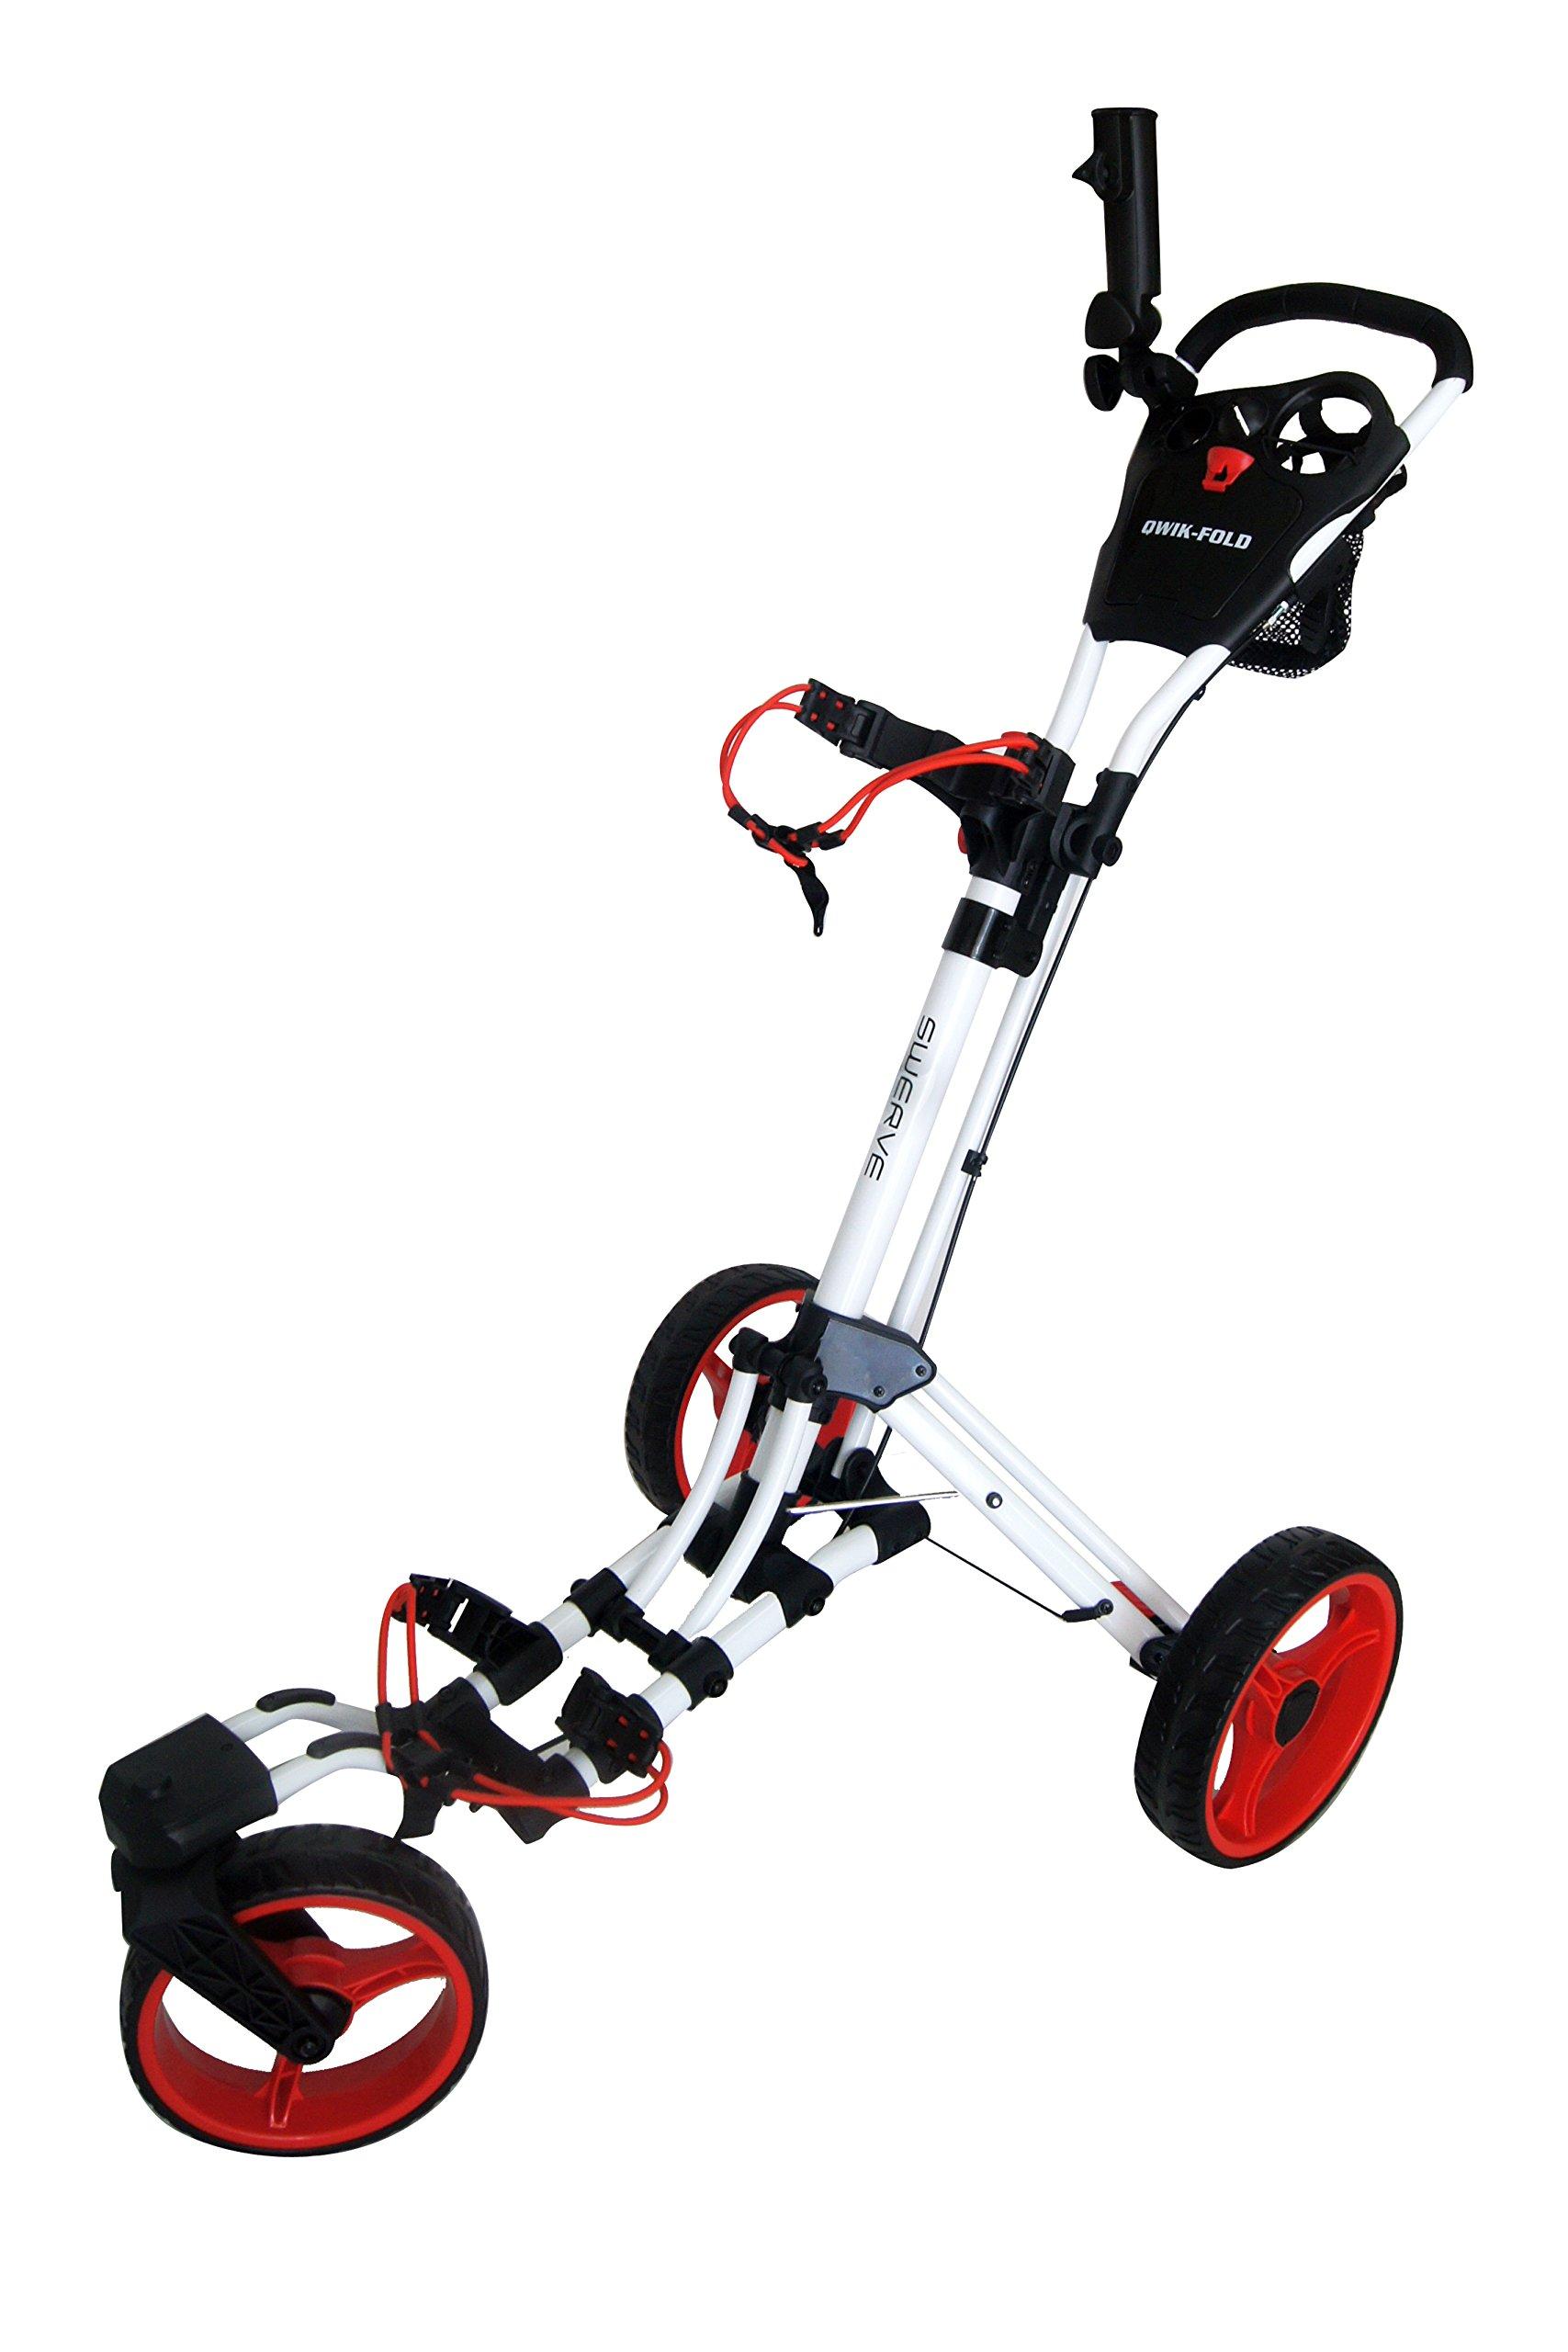 Swerve Founders Club 360 Swivel Wheel Qwik Fold Golf Push Cart (White)